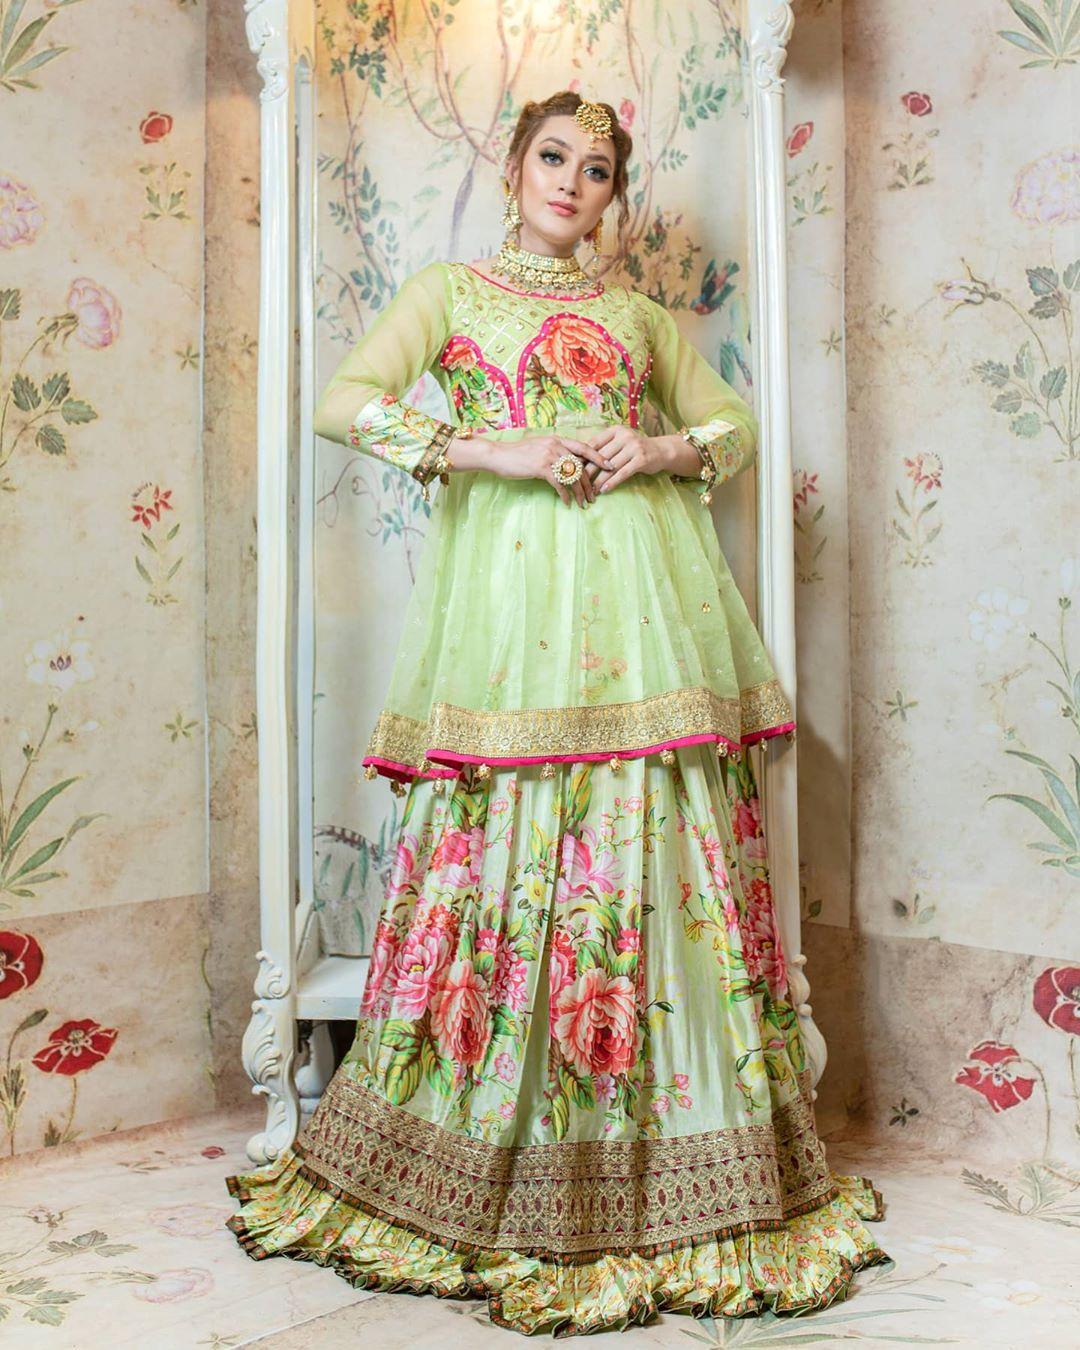 Ehd-e-Wafa Actress Momina Iqbal Majestic Looks from Bridal Photo Shoot